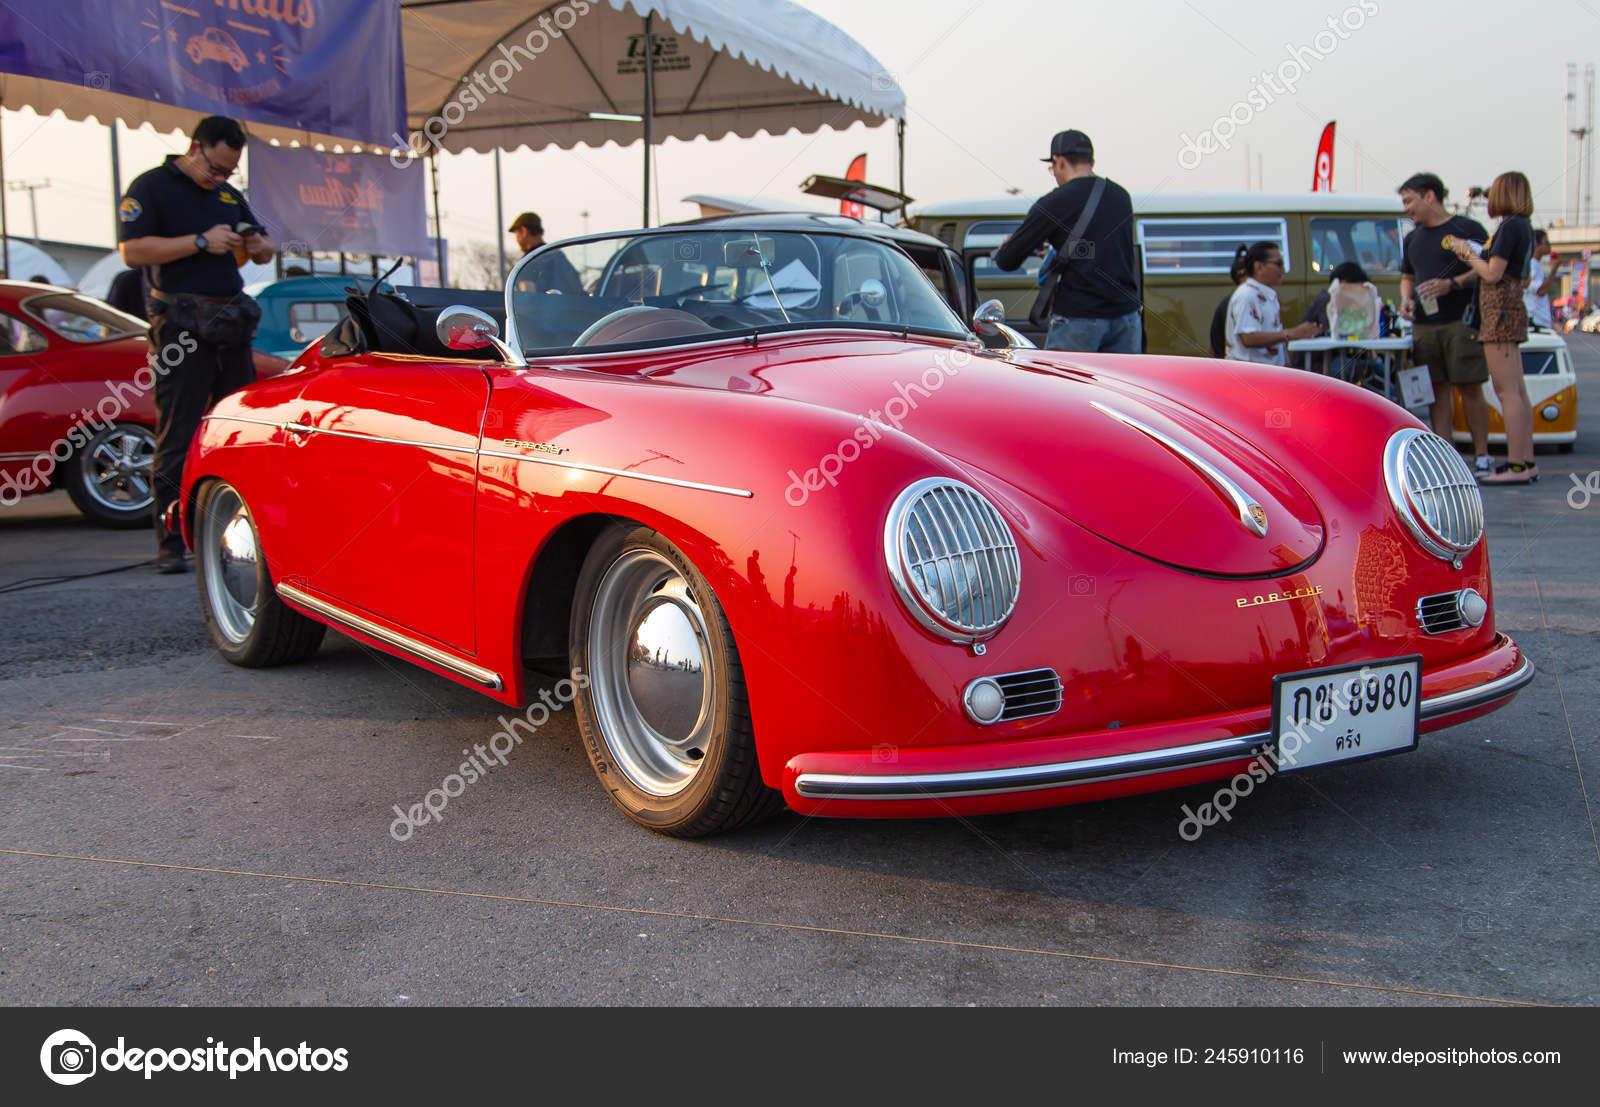 Bangkok Thailand February 2019 Vintage Porsche 356 Speedster Convertible Show Stock Editorial Photo C Isampuntarat Gmail Com 245910116